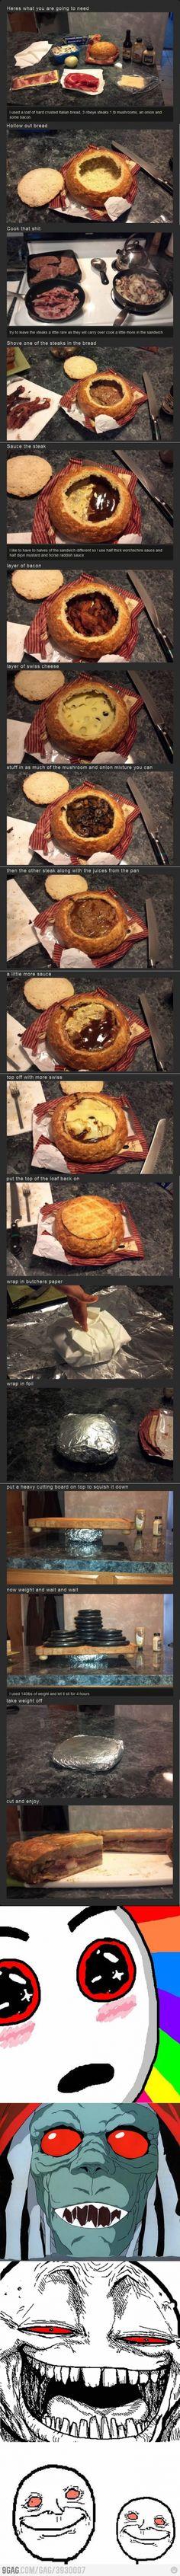 Epic Sanwich